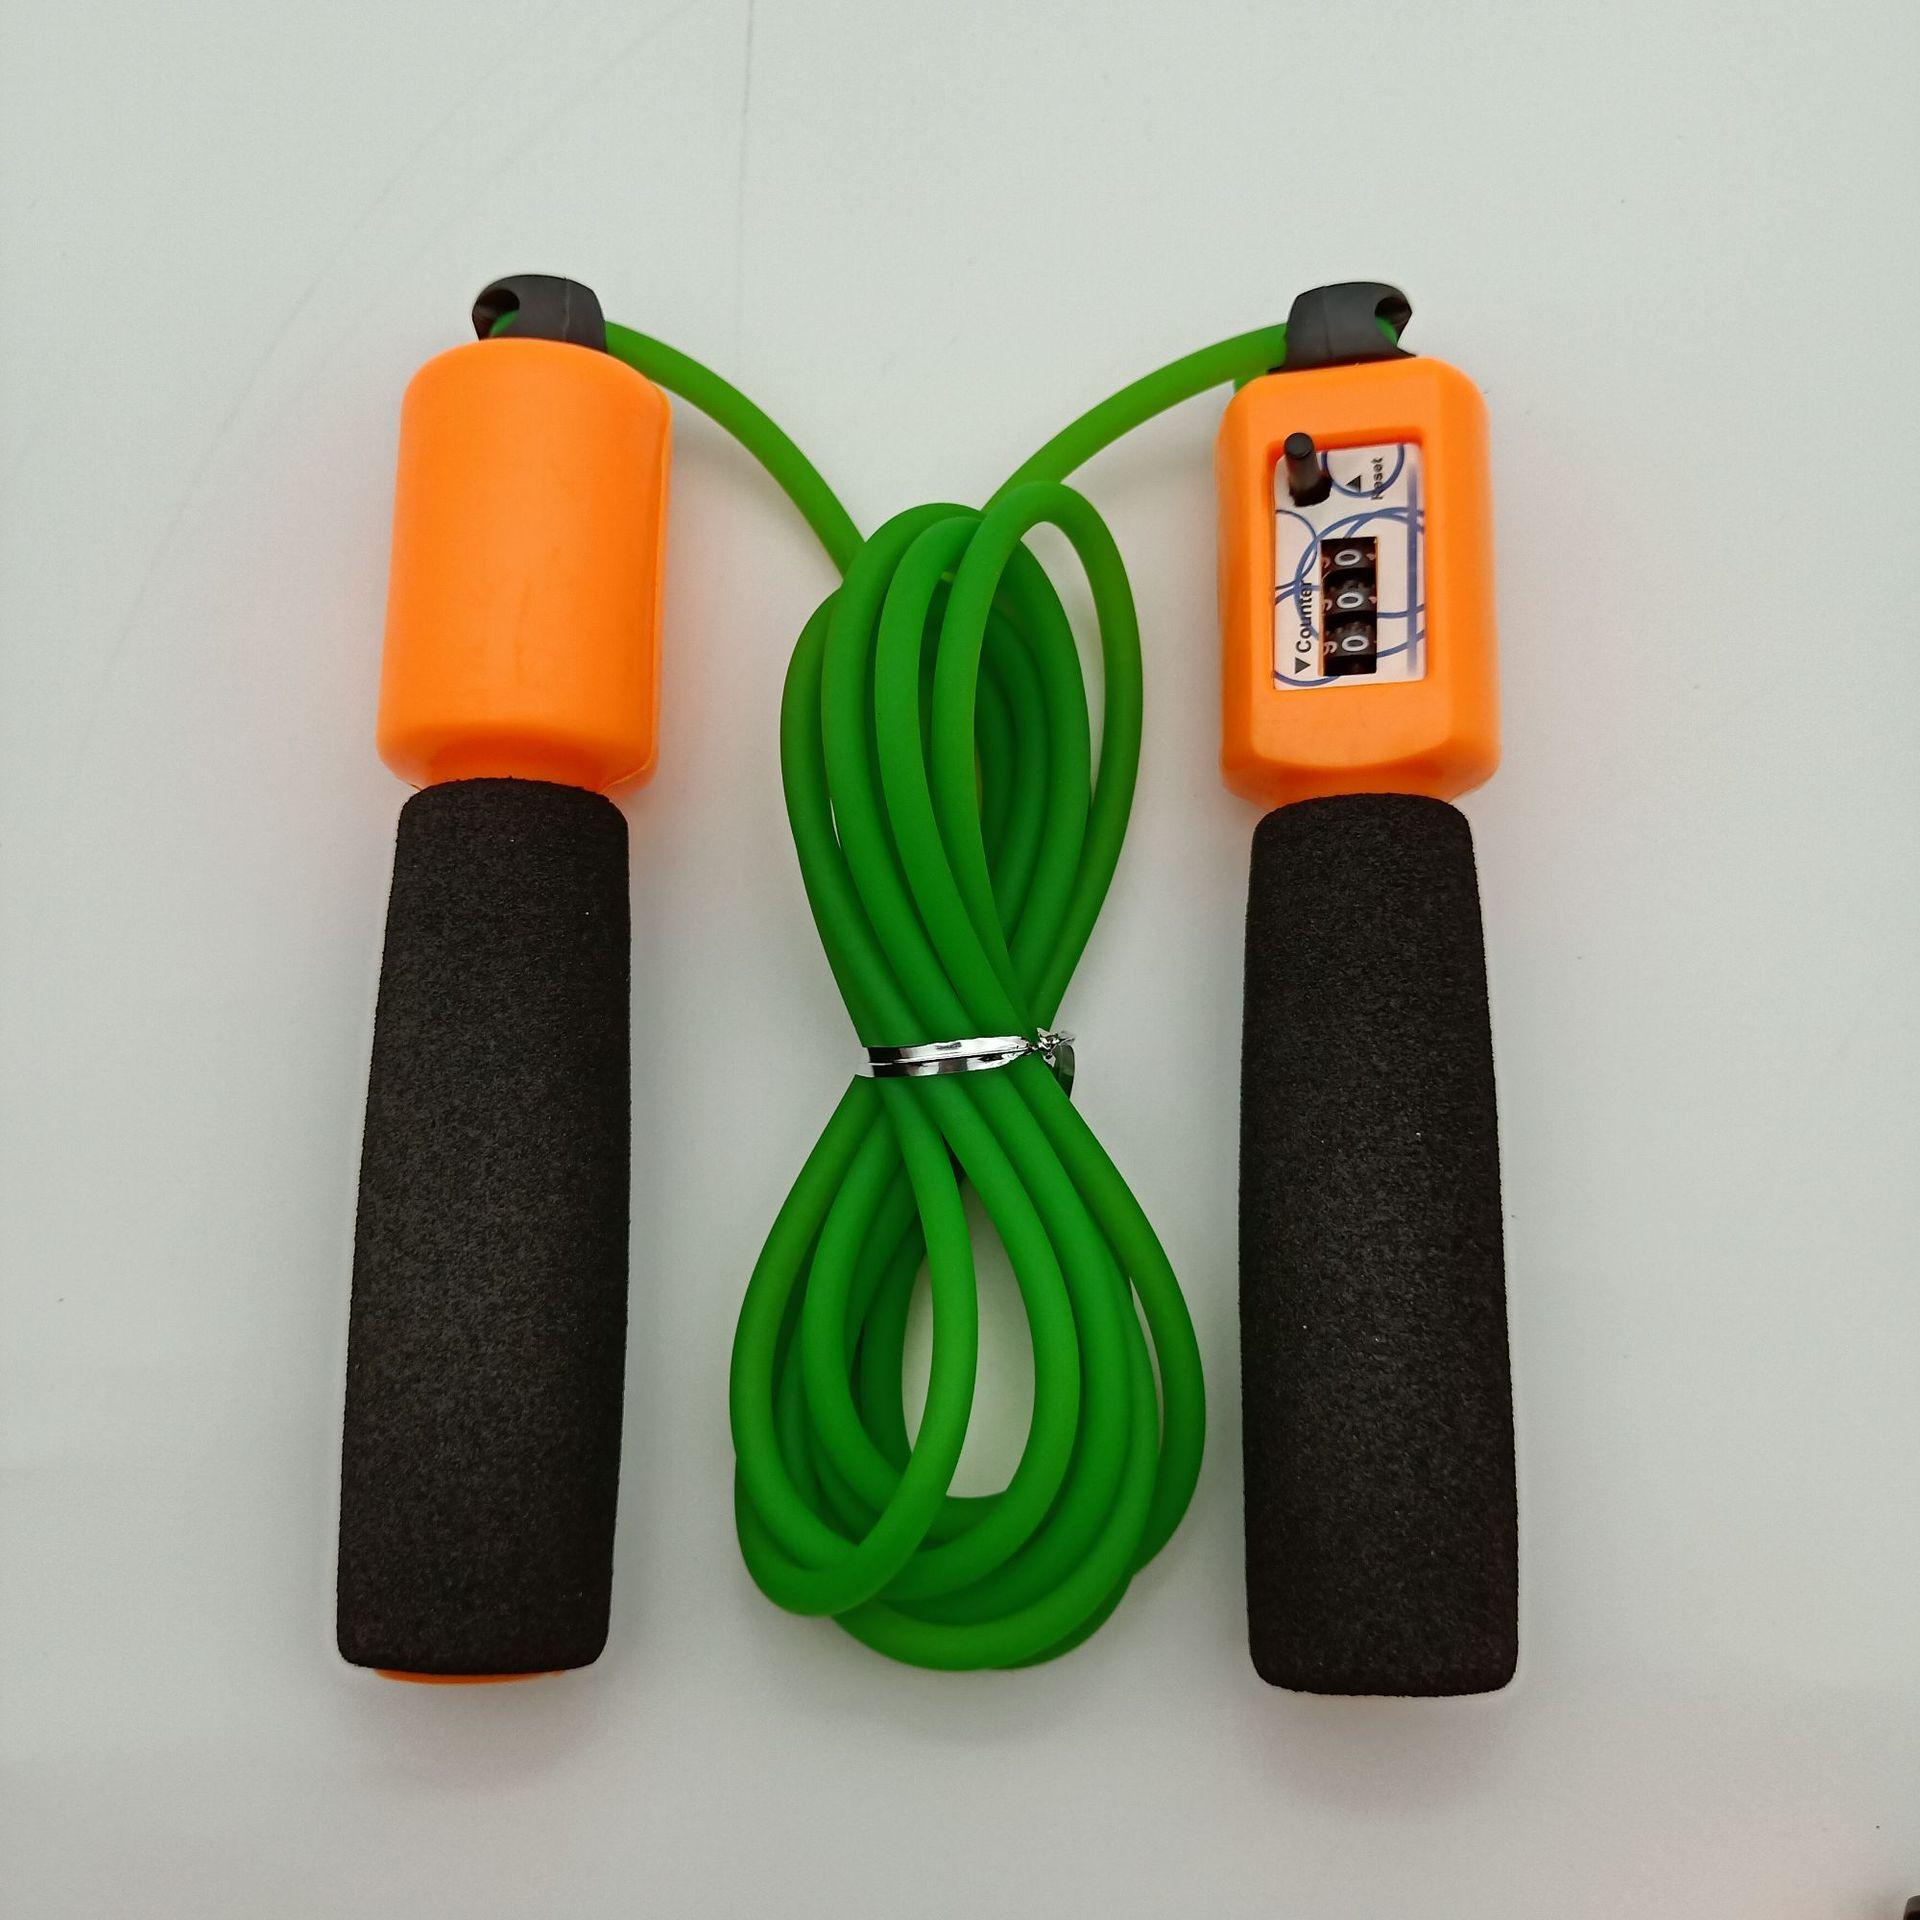 Liang Jian Manufacturers Direct Selling Sports Activity Jump Rope Sponge Plastic Big Screen Count Handle PVC Bag Fitness Jump Ro